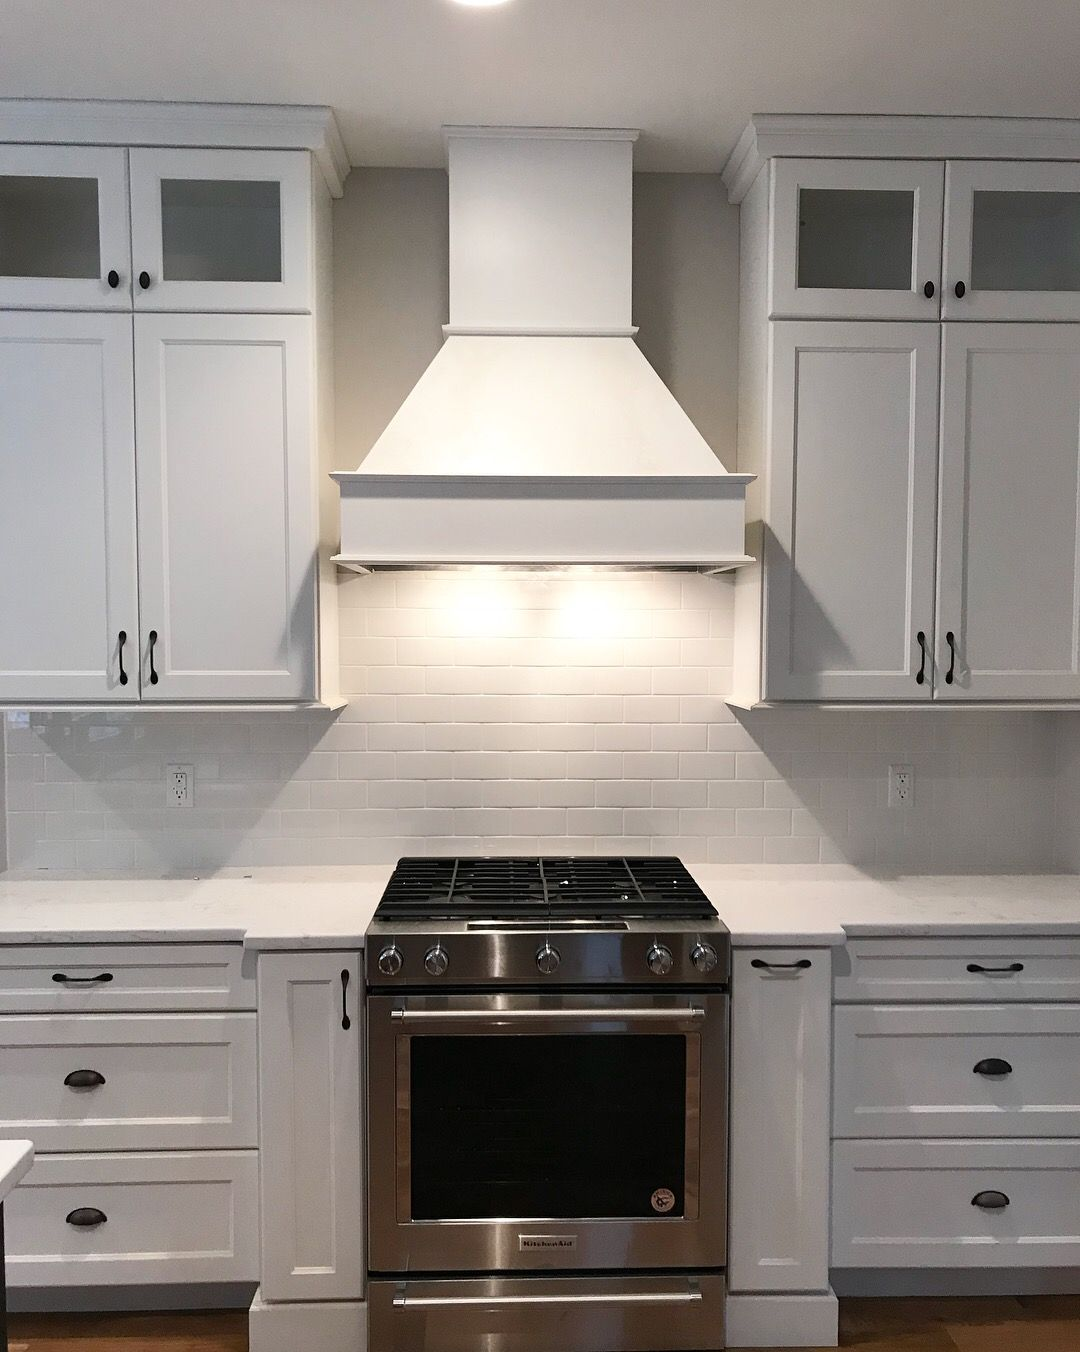 Chimney Hood Backsplash ~ Modern farmhouse white kitchen with subway tile